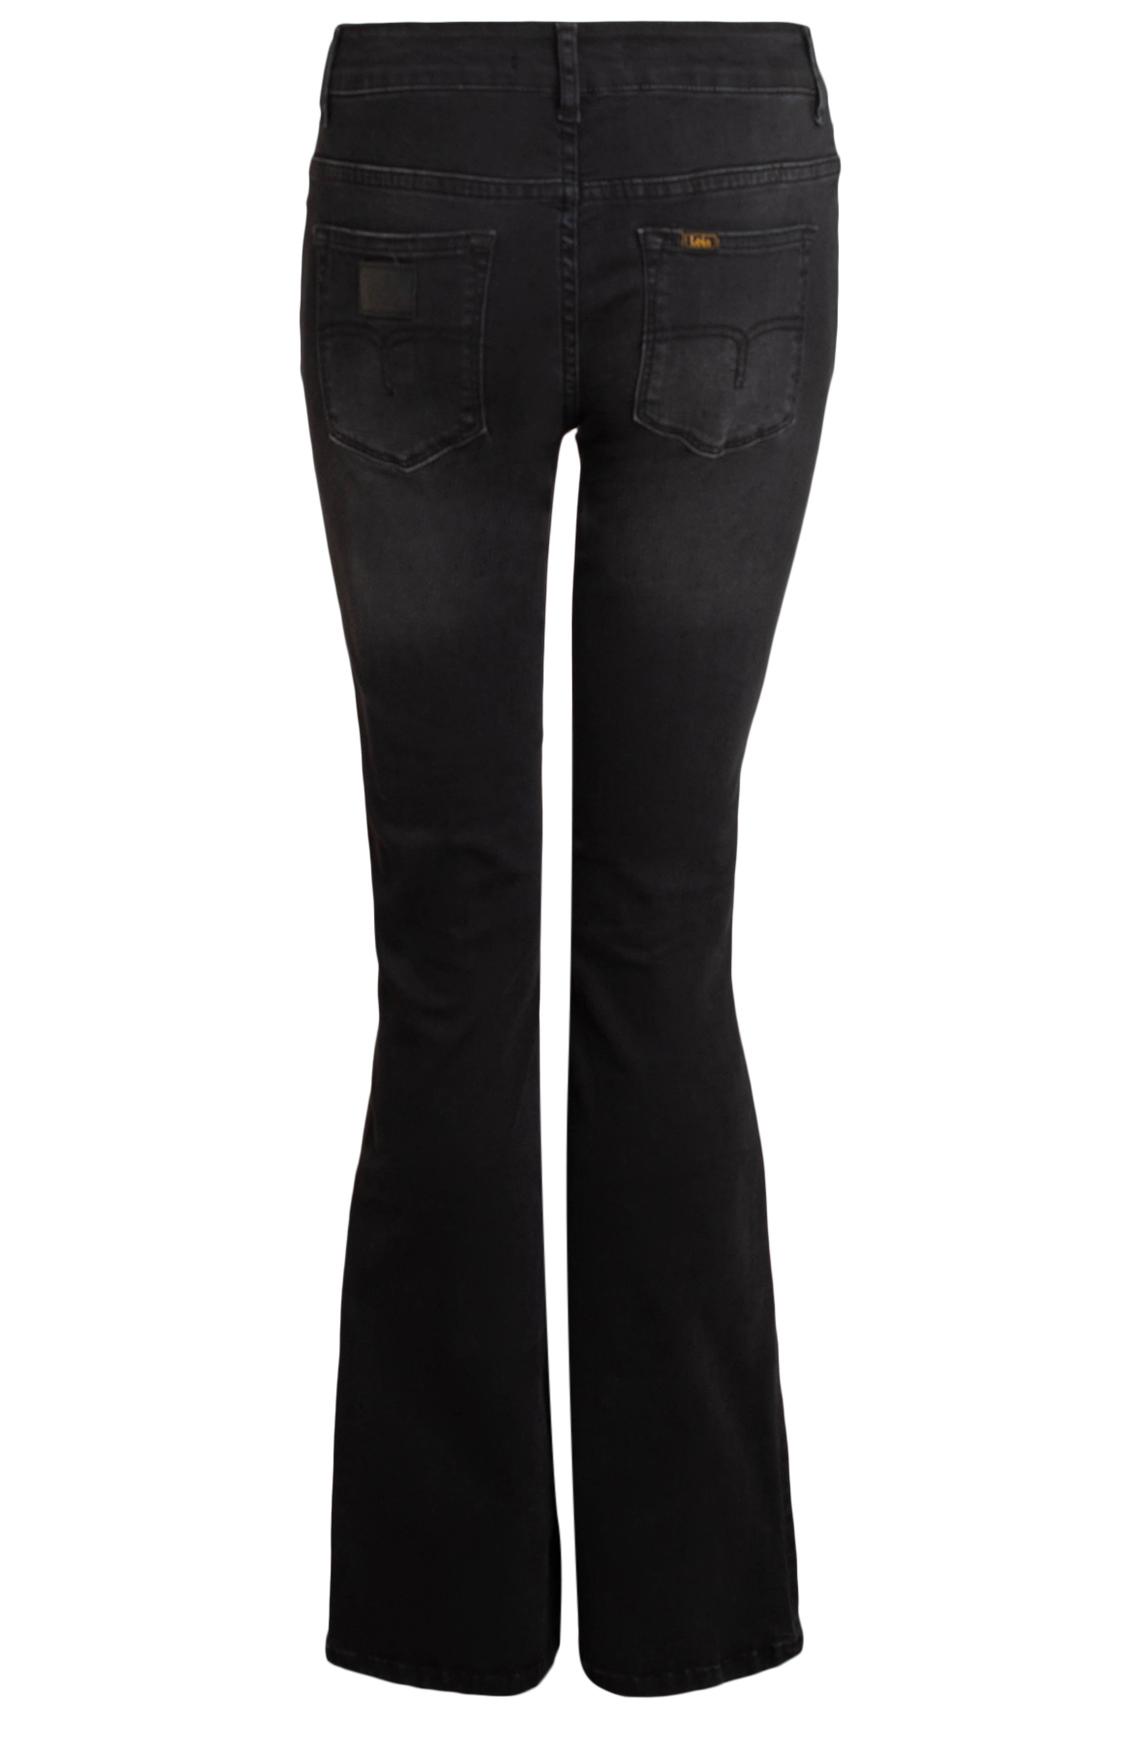 Lois Dames L34 Leia Onix flared jeans zwart